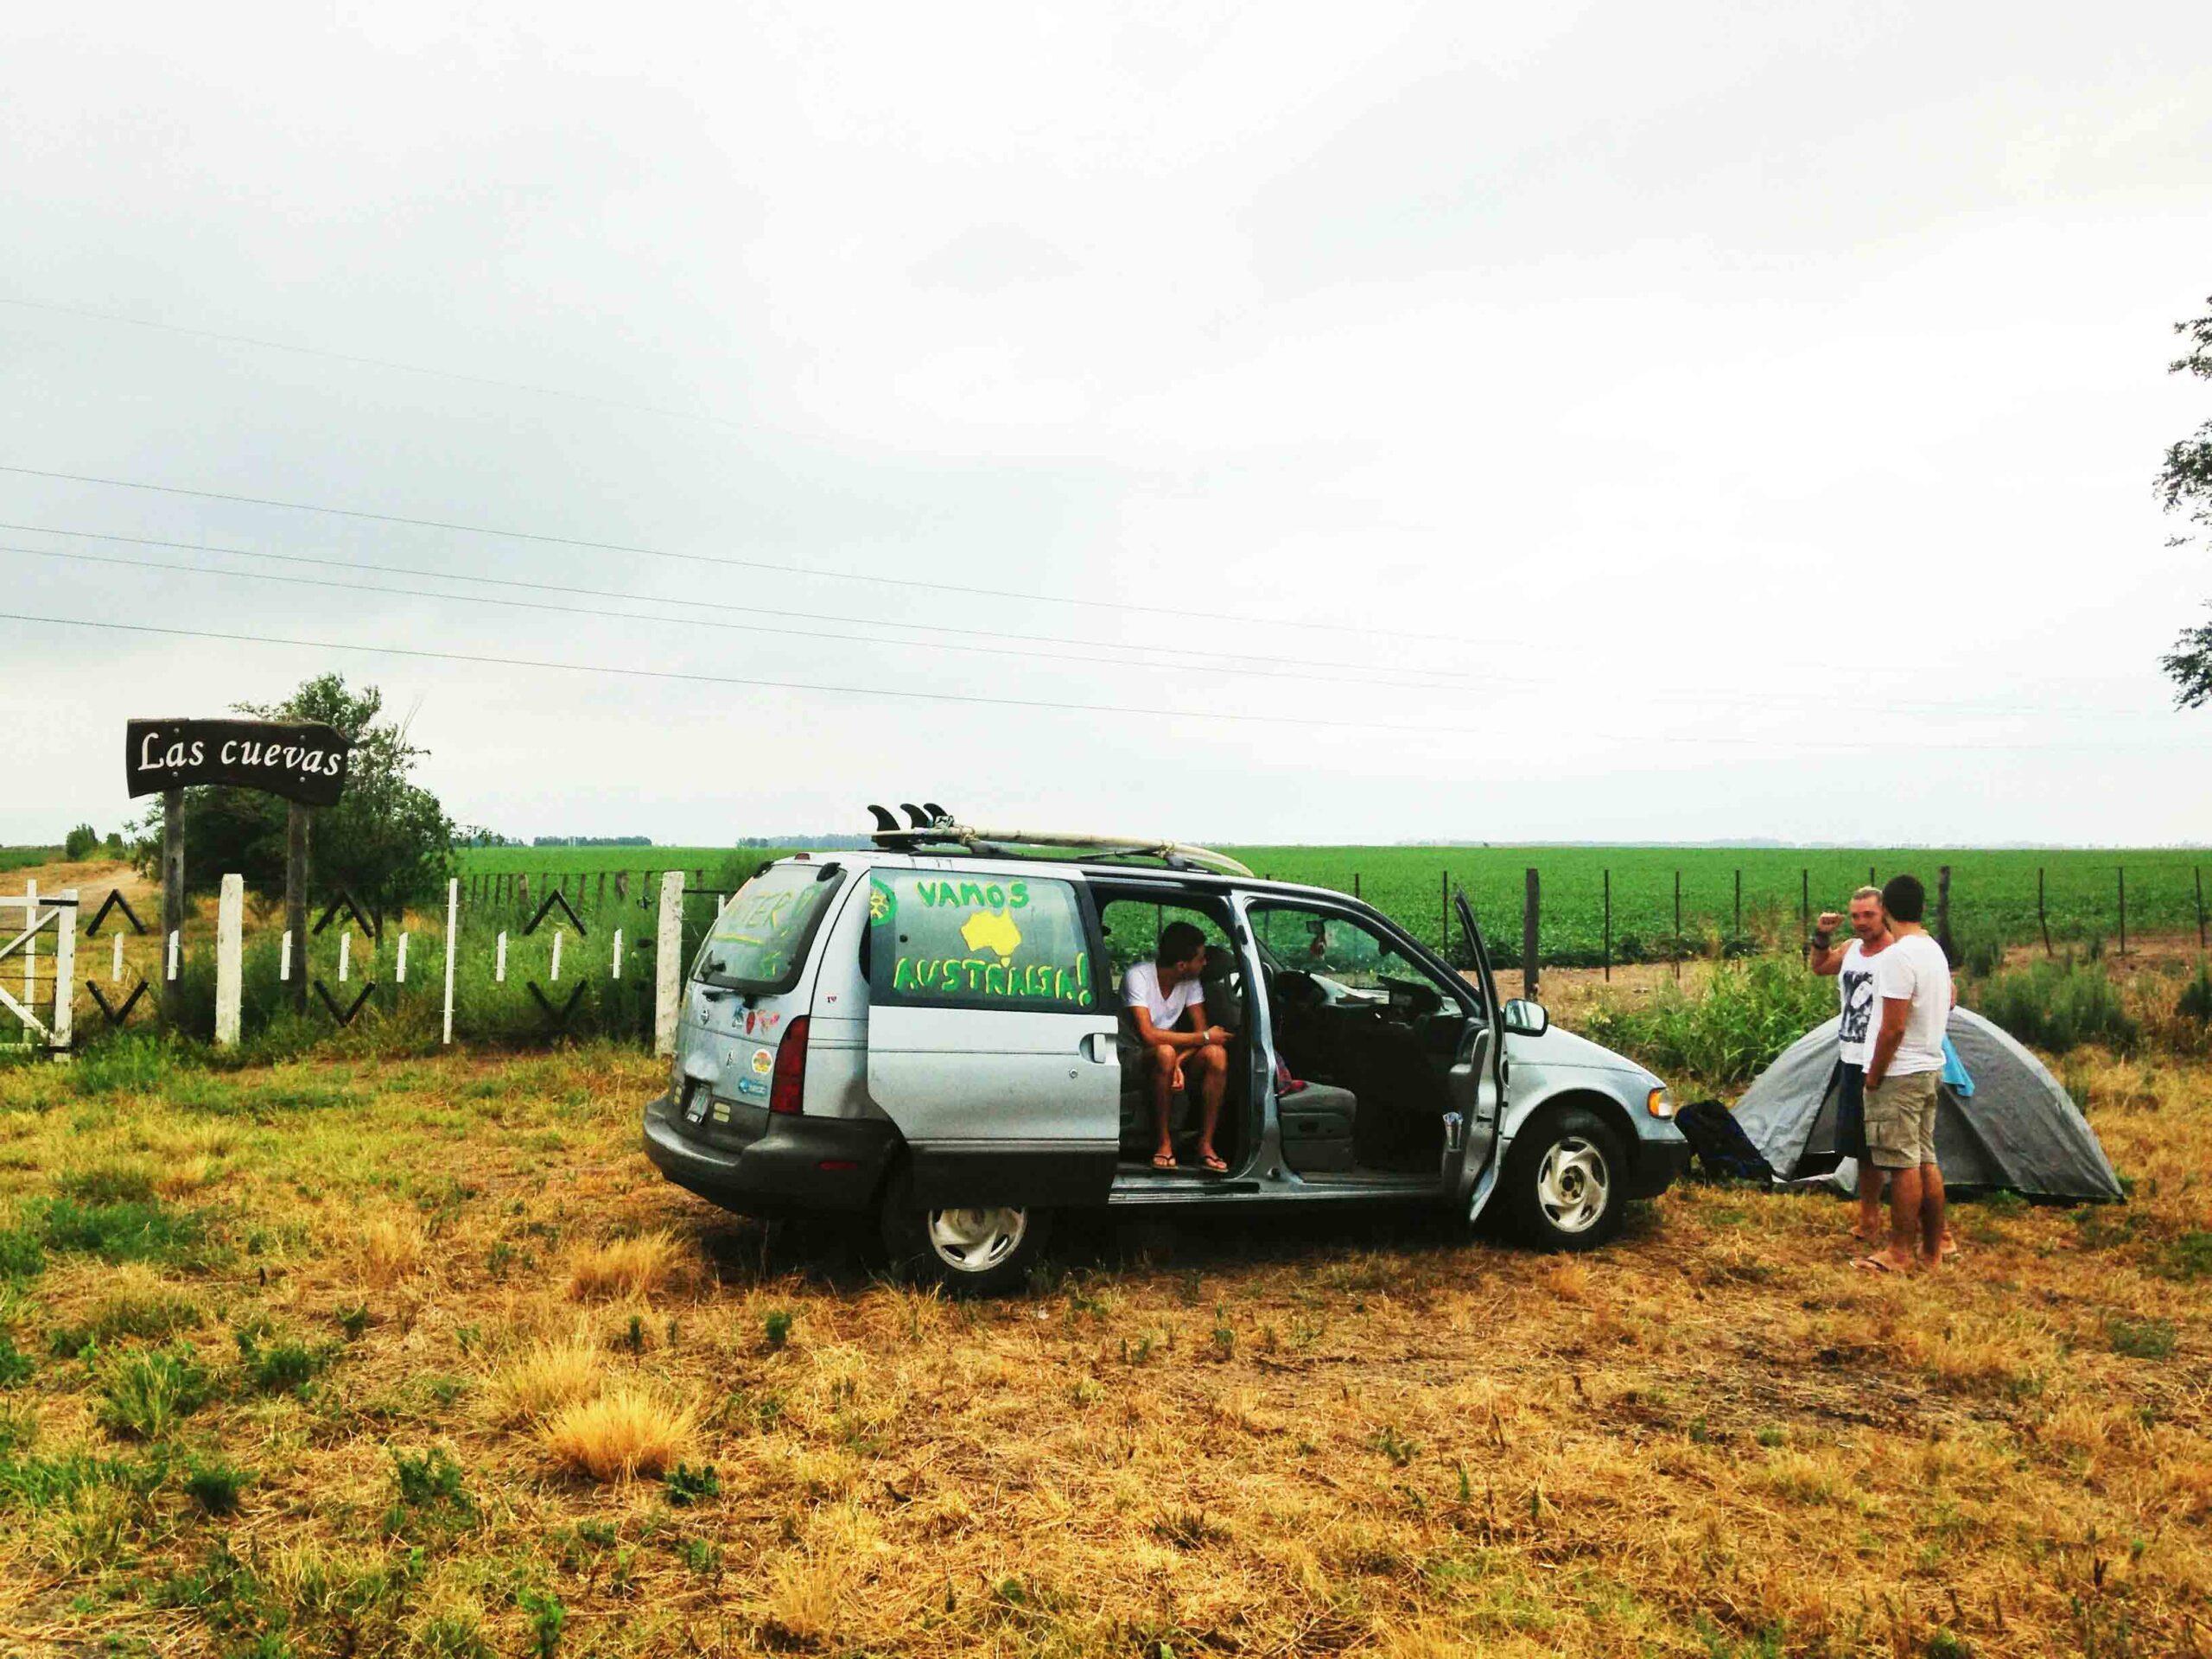 Road trip through Patagonia Argentina